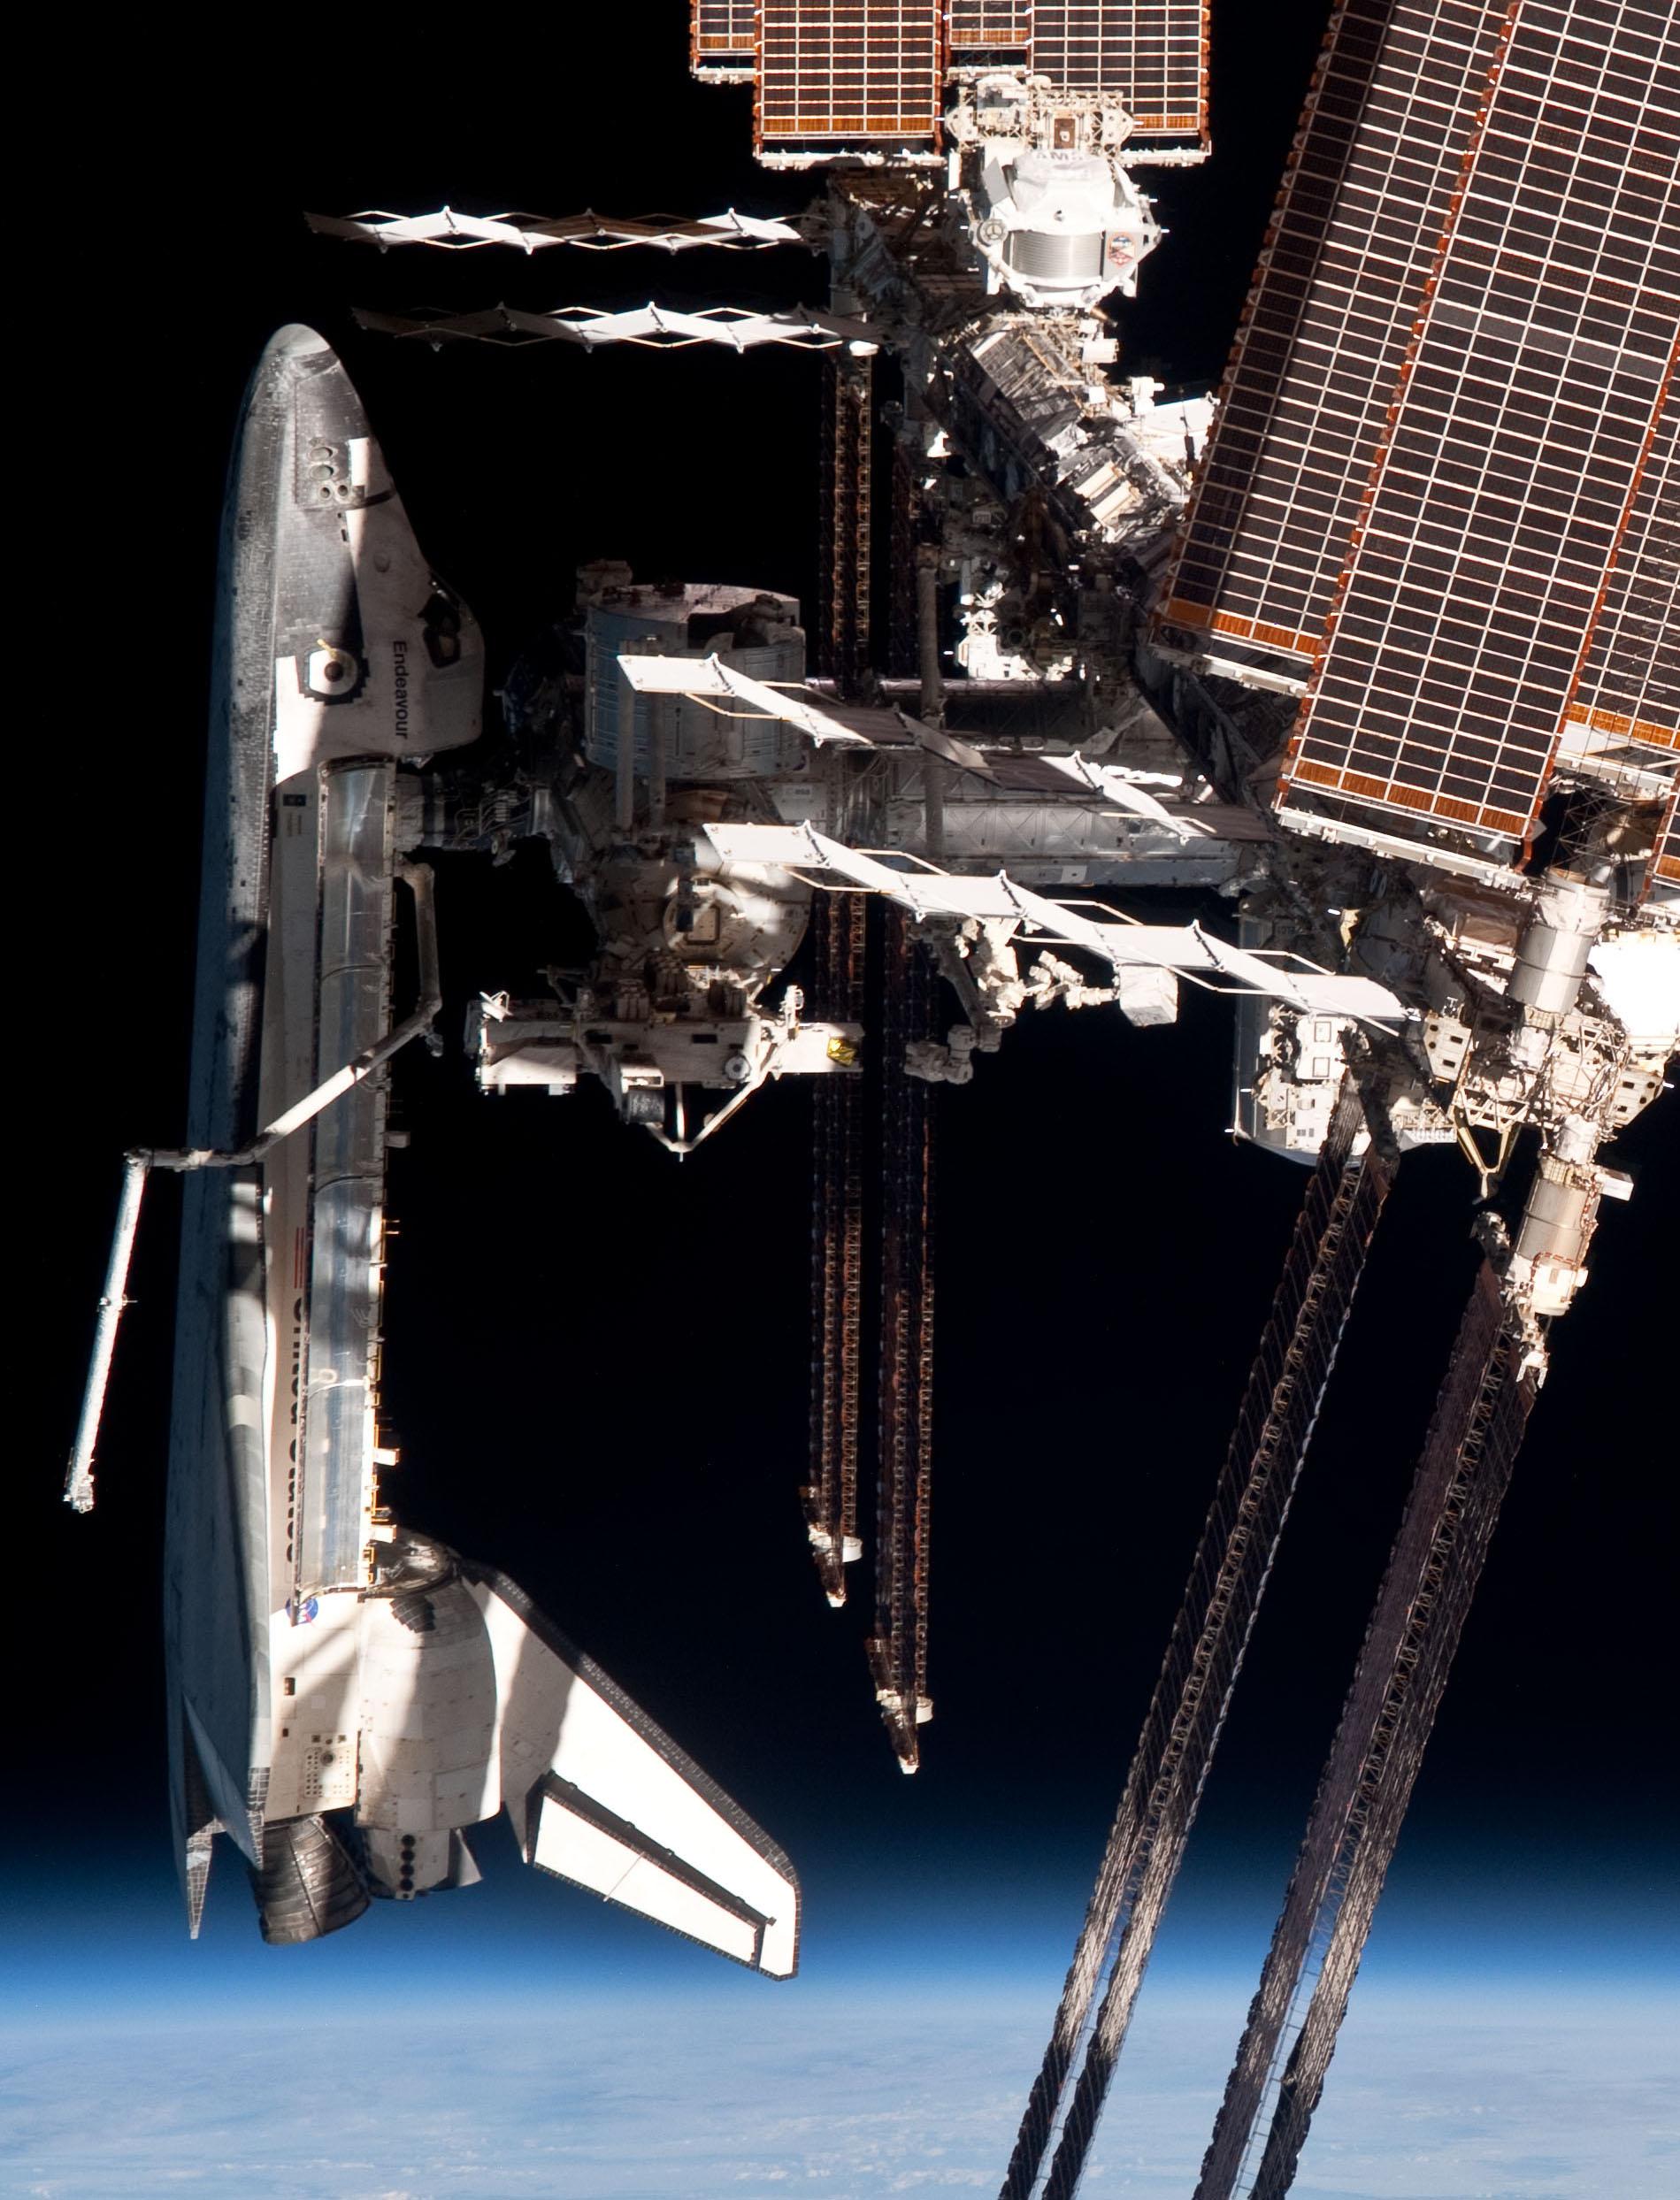 space station nasa - photo #40